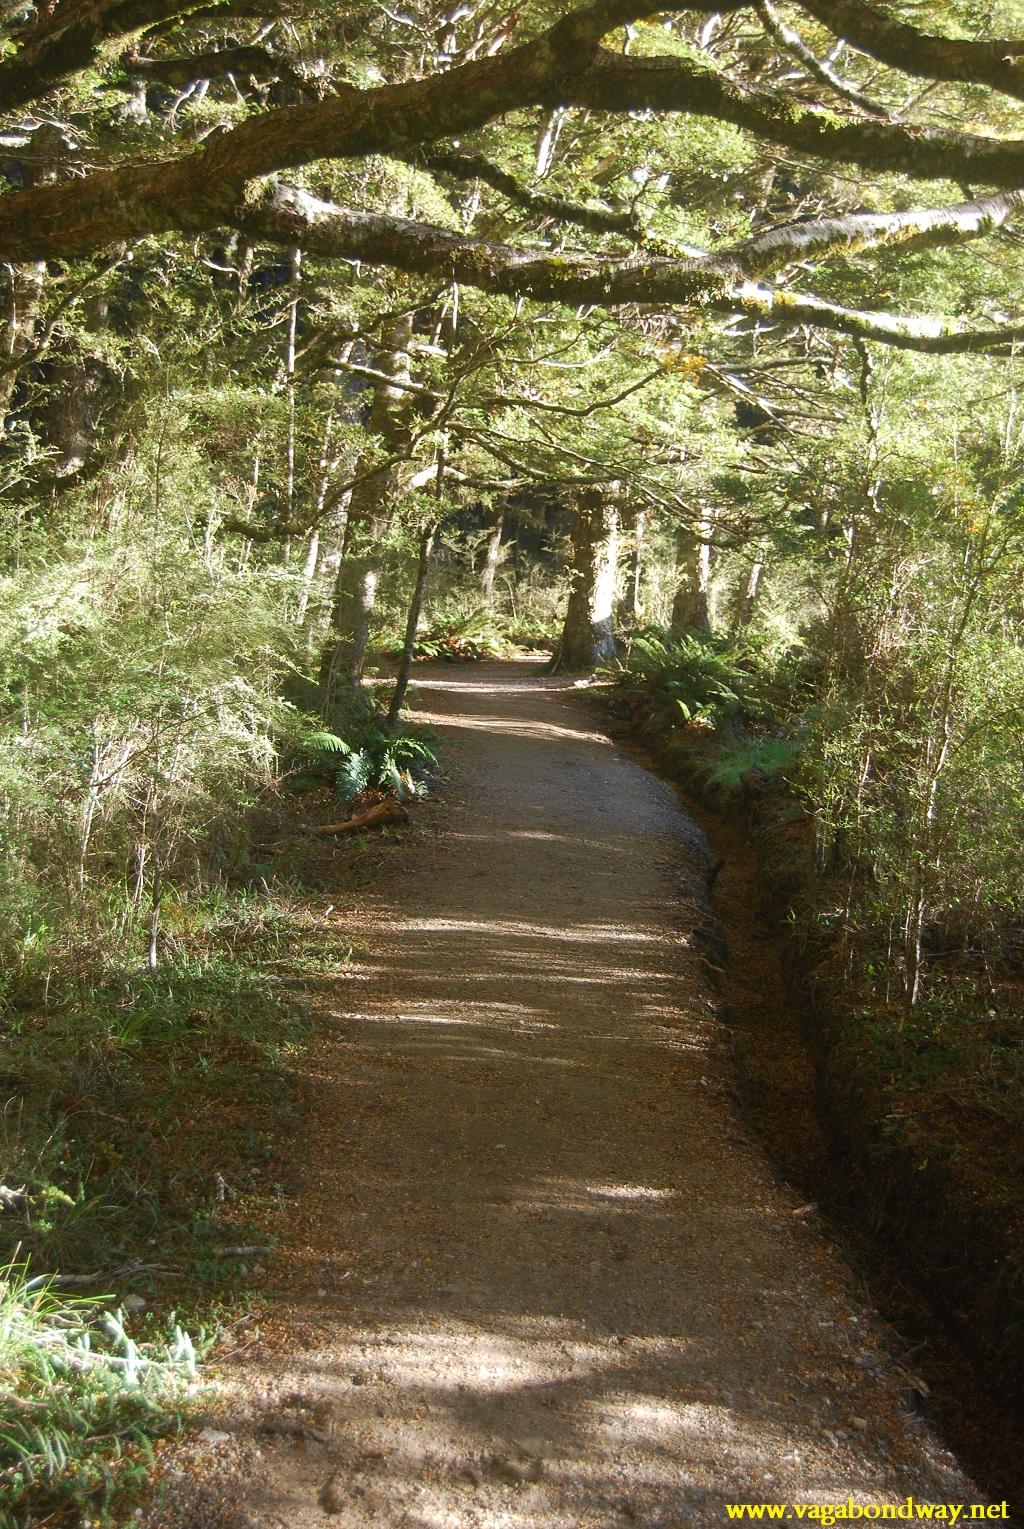 End of hike in Kepler, NZ